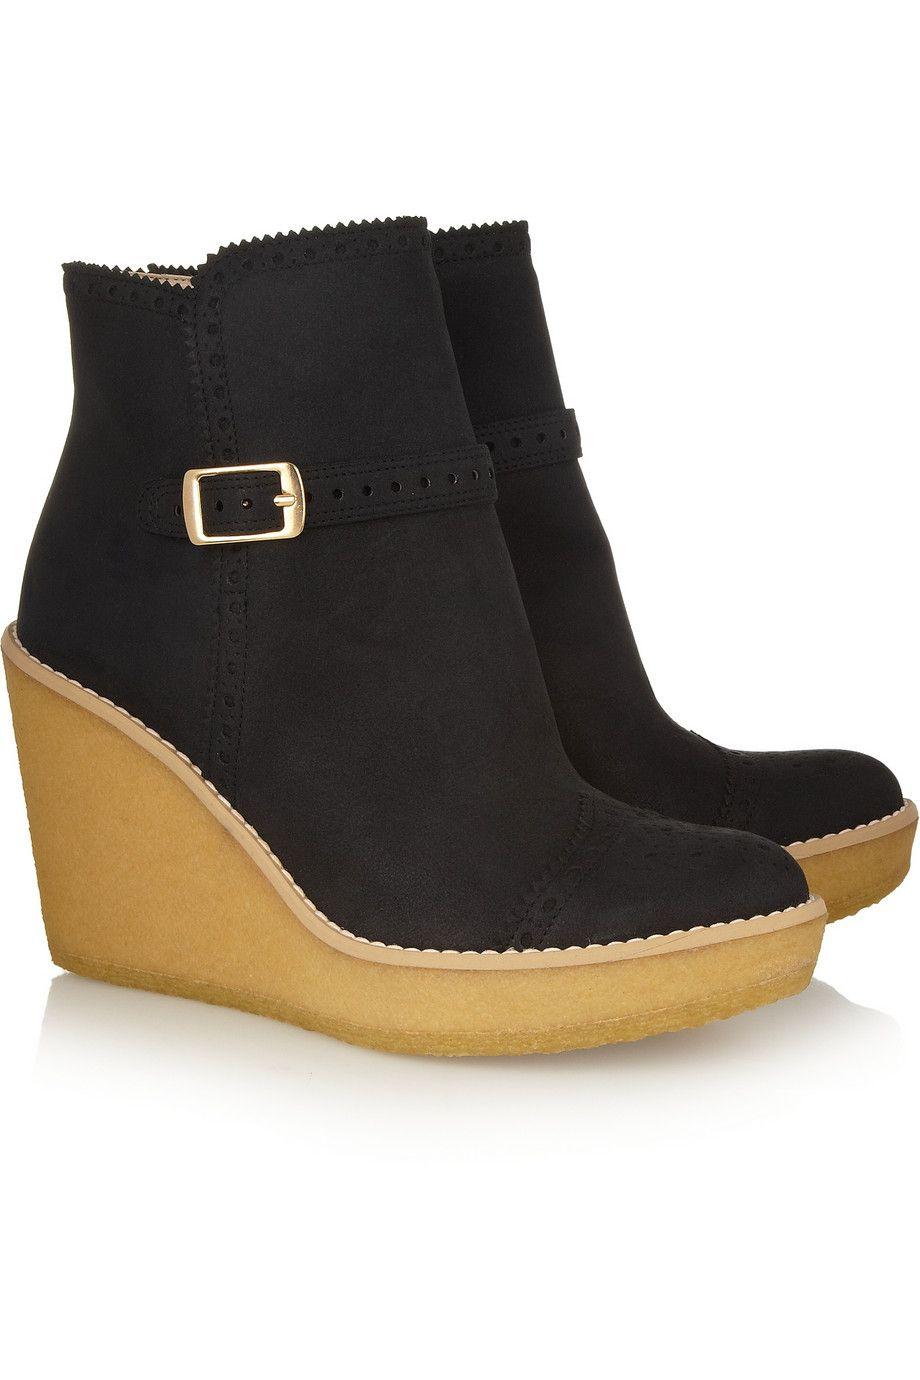 Stella McCartney Vegan Wedge Booties cheap sale footaction cheapest price online 0EEq5